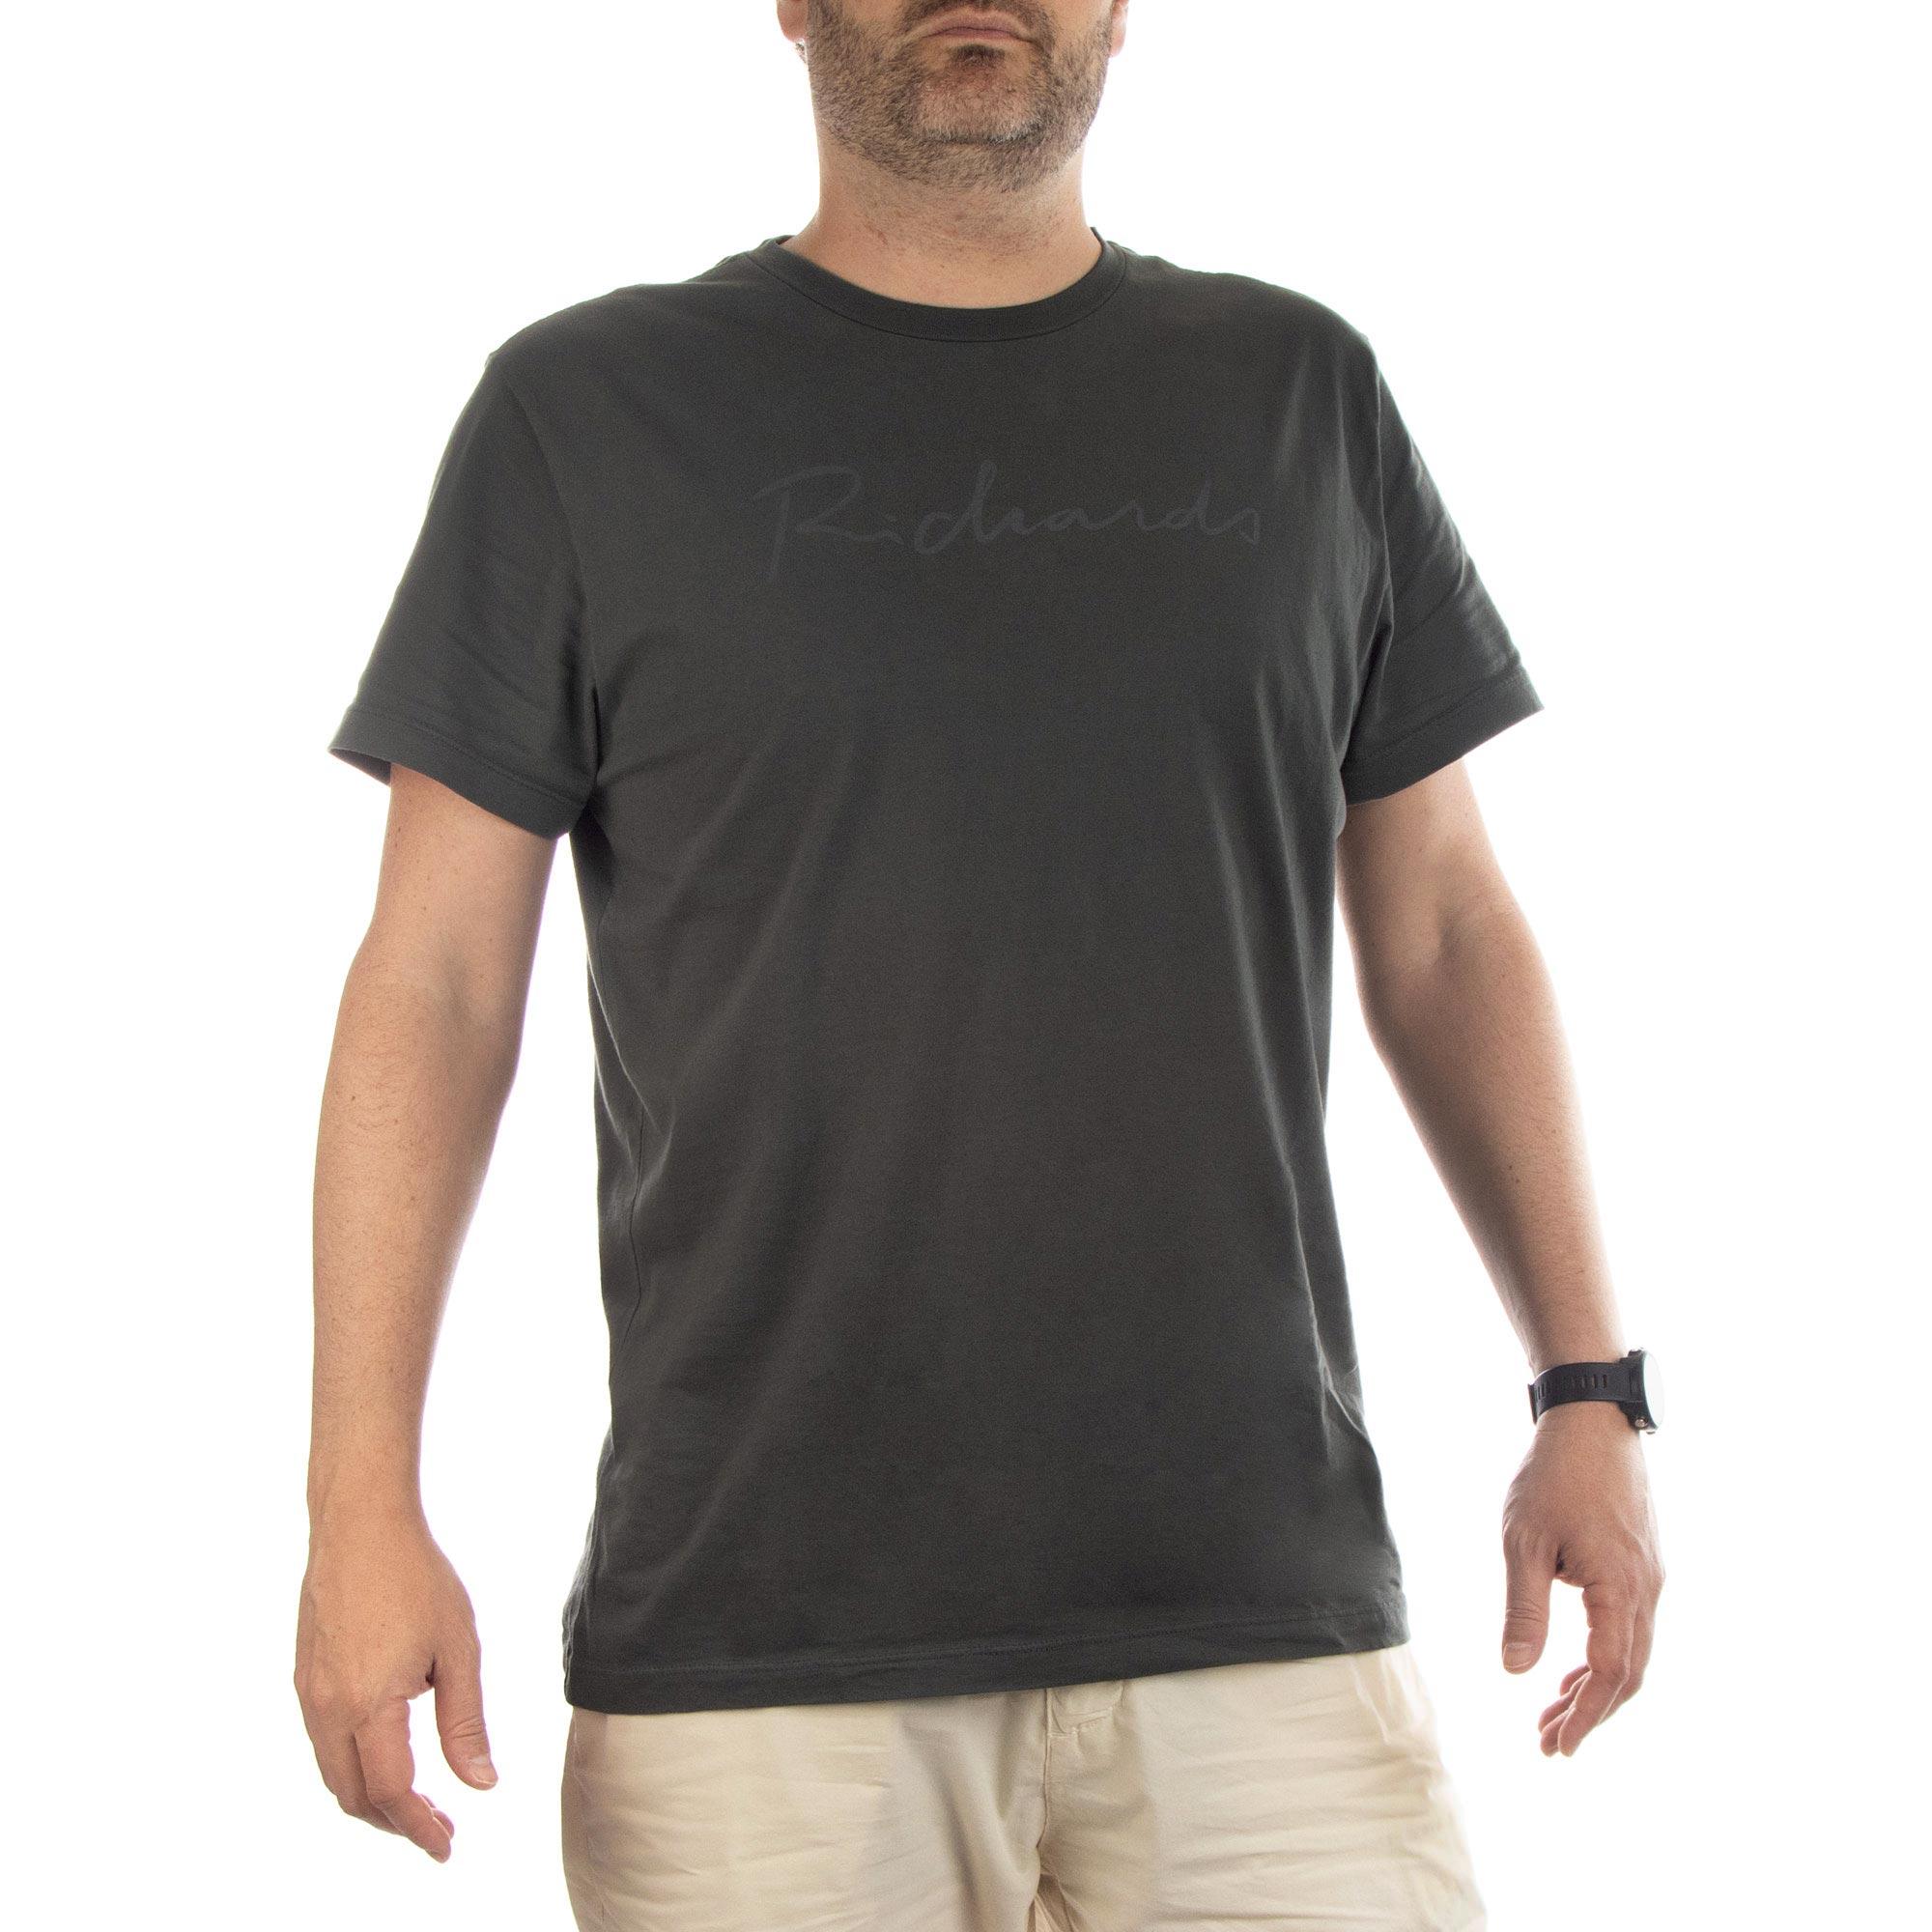 Richards Camiseta Manuscrito Richards Manga Curta Masculino Verde Militar